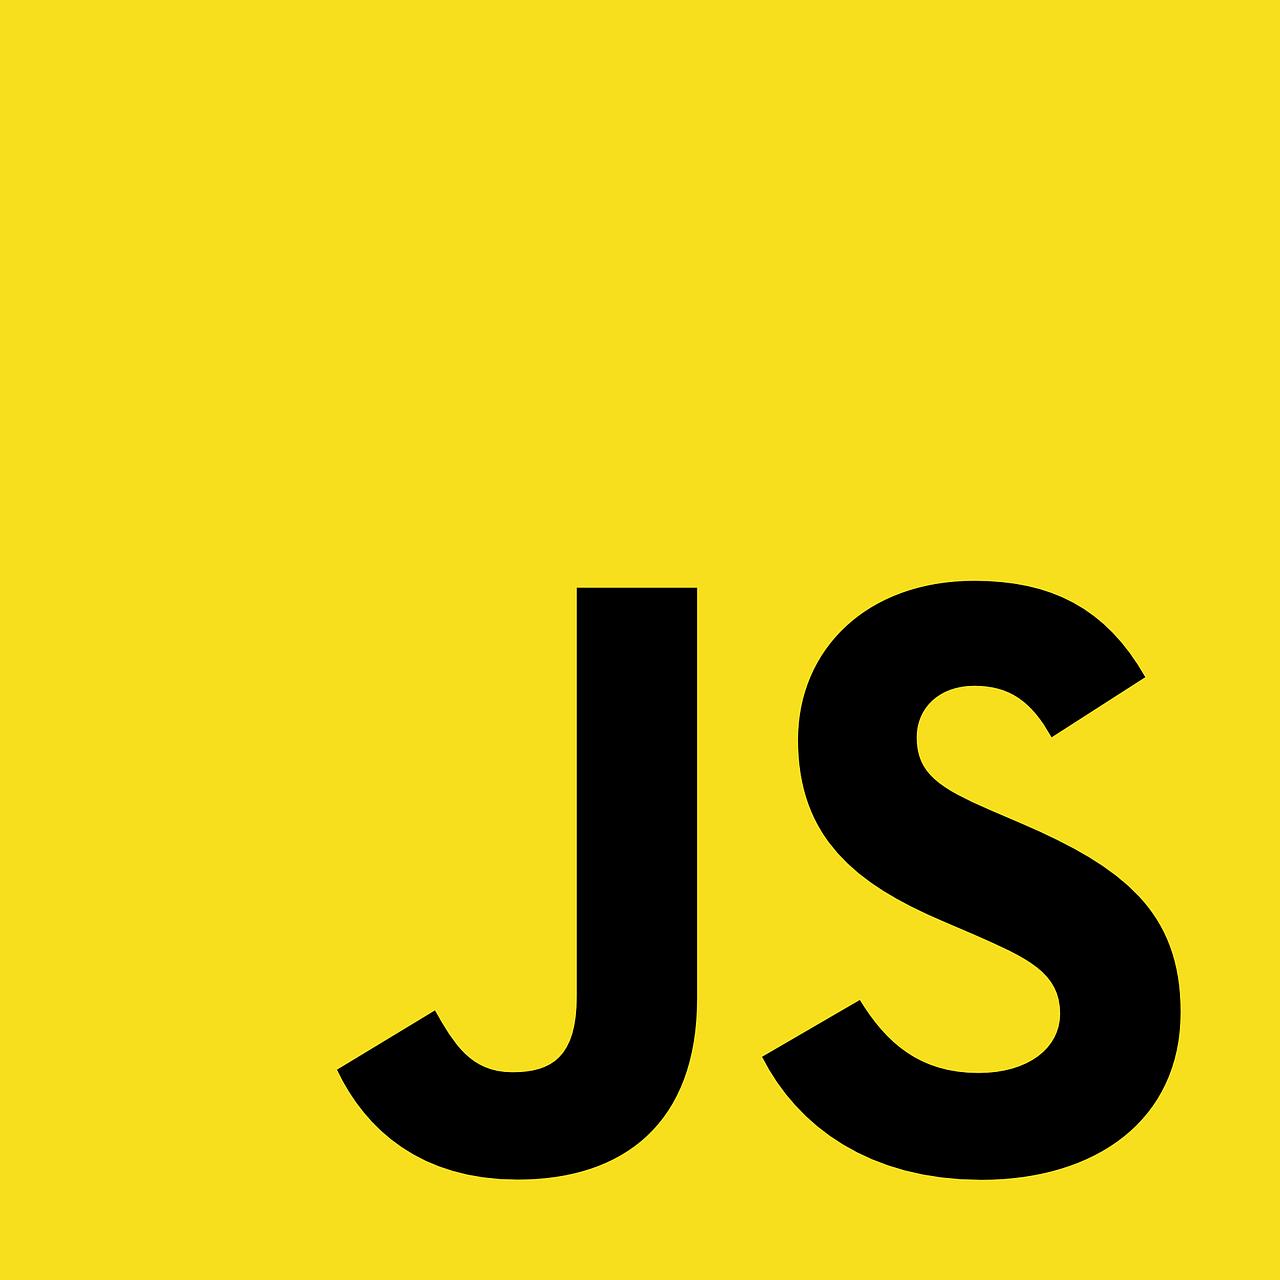 javascript add global variable to window